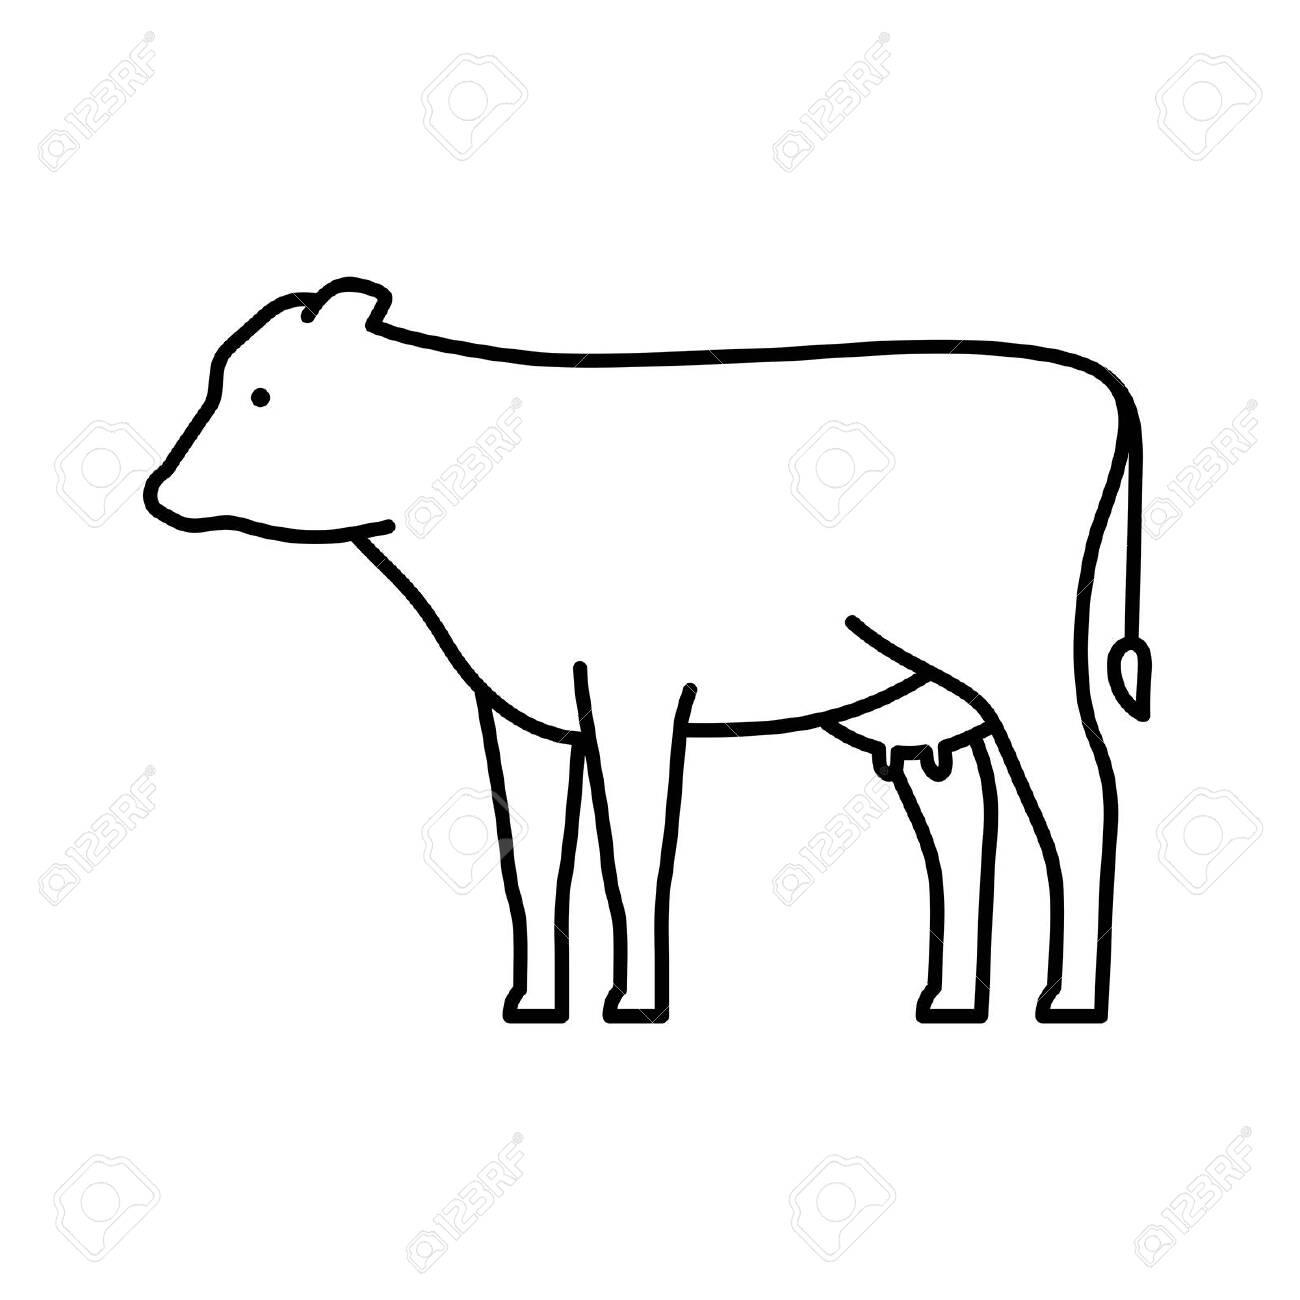 Cow line icon. Icon design. Template elements - 134493155